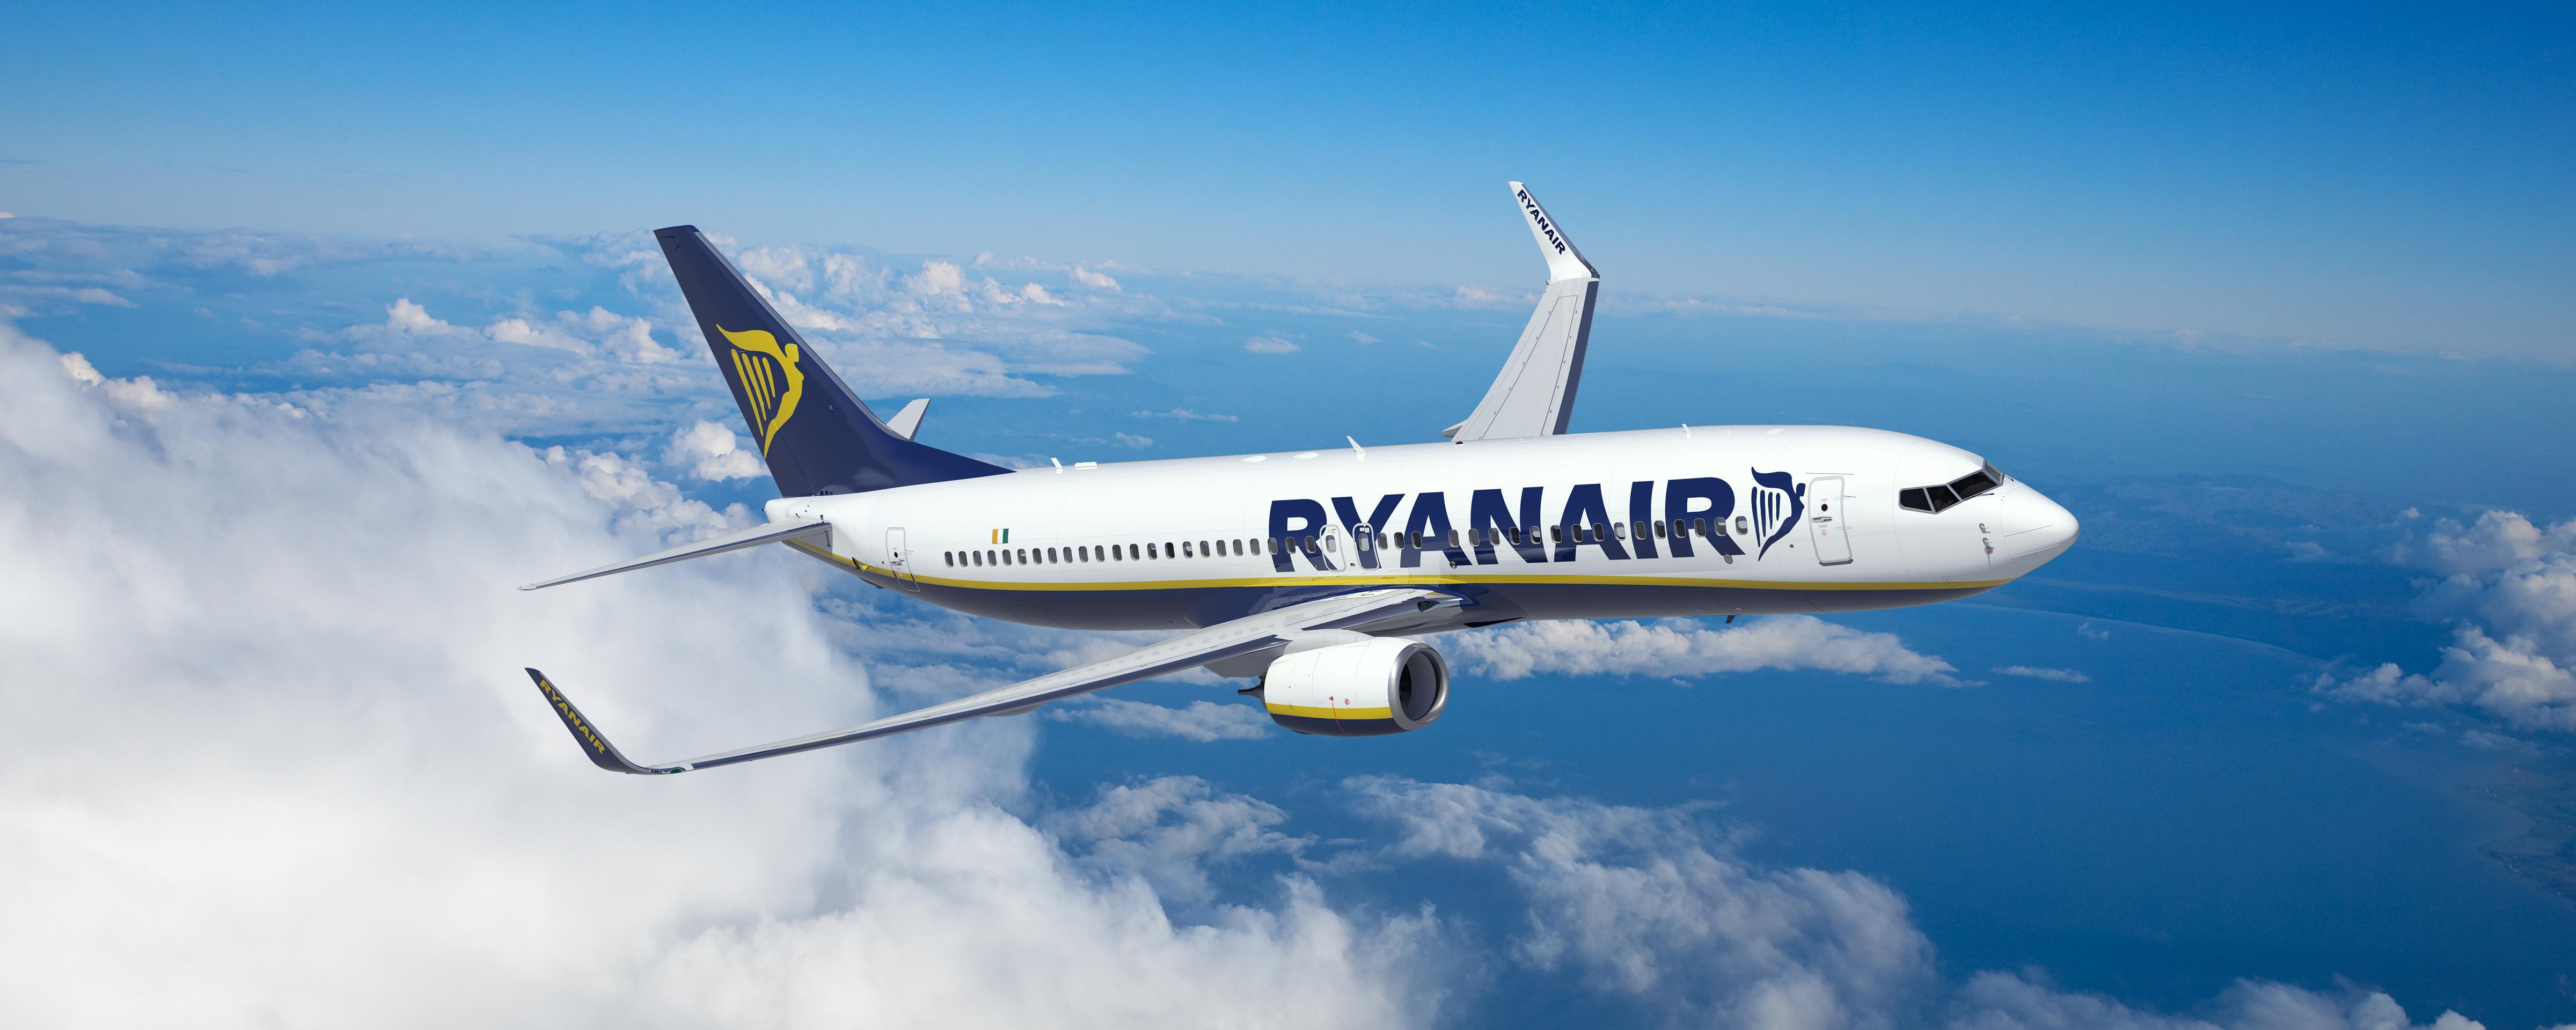 Risultati immagini per Ryanair